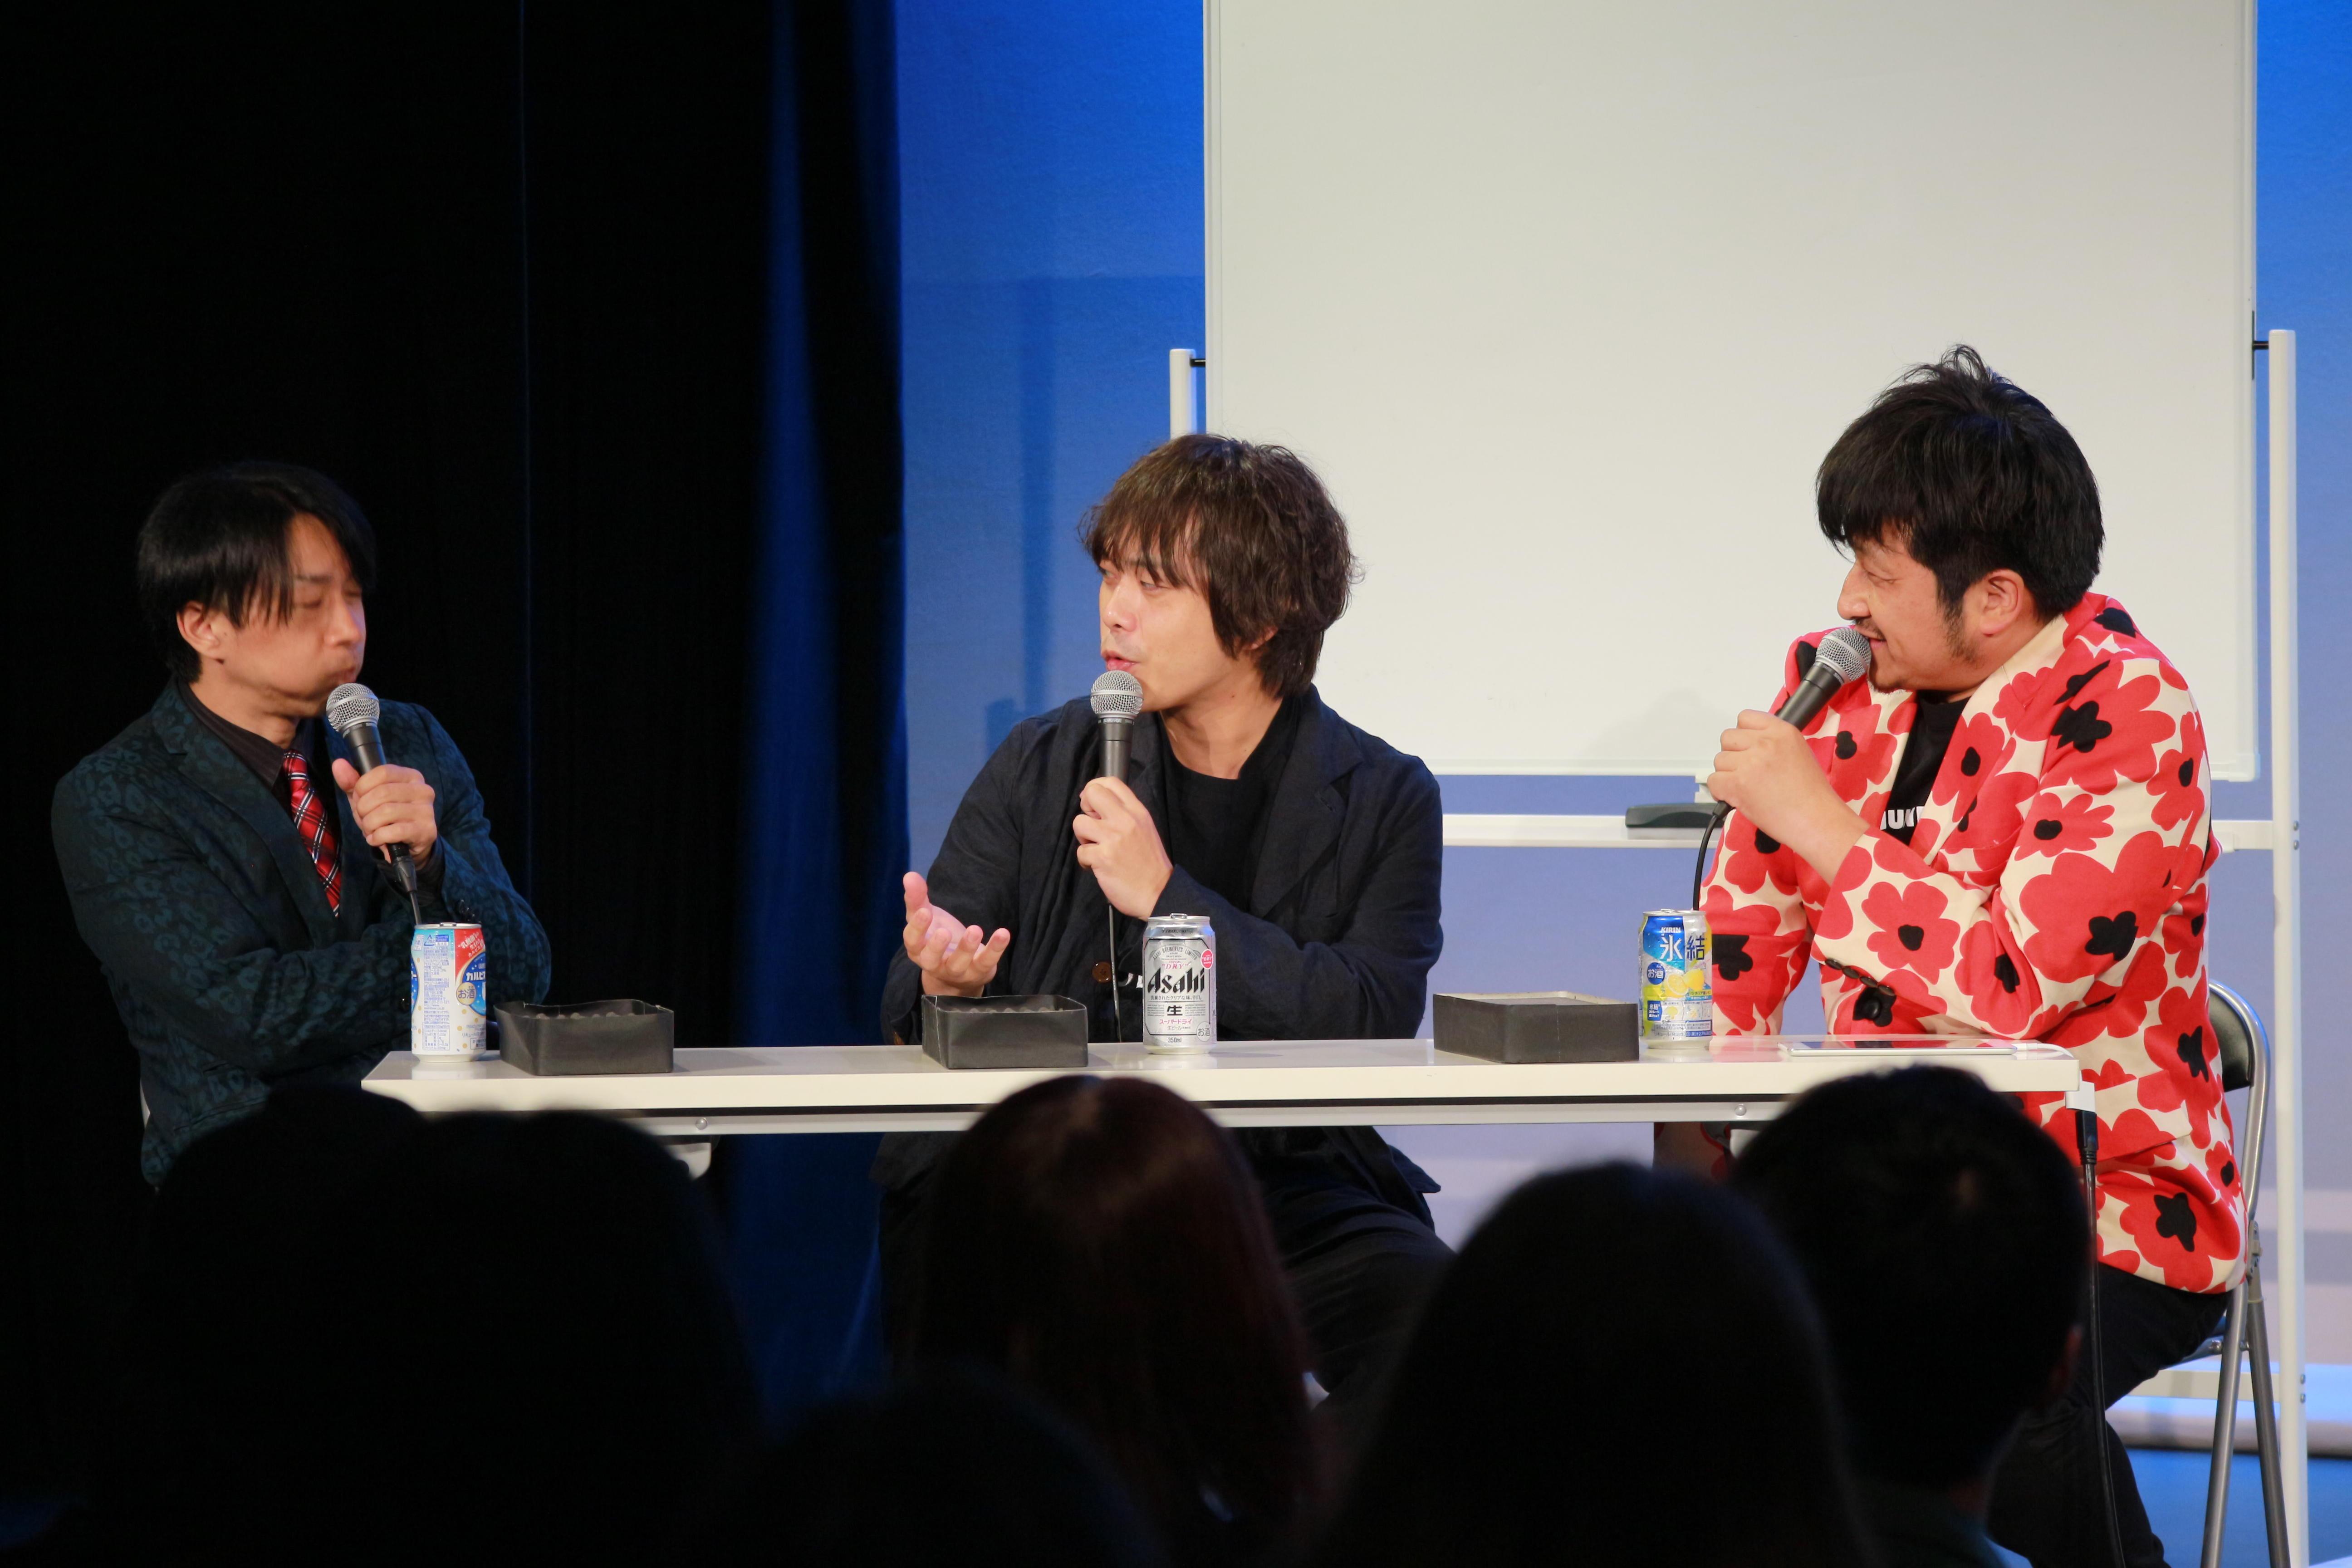 http://news.yoshimoto.co.jp/20180512231847-4b01f98709a56e89104a180bad702e4e8f414513.jpg